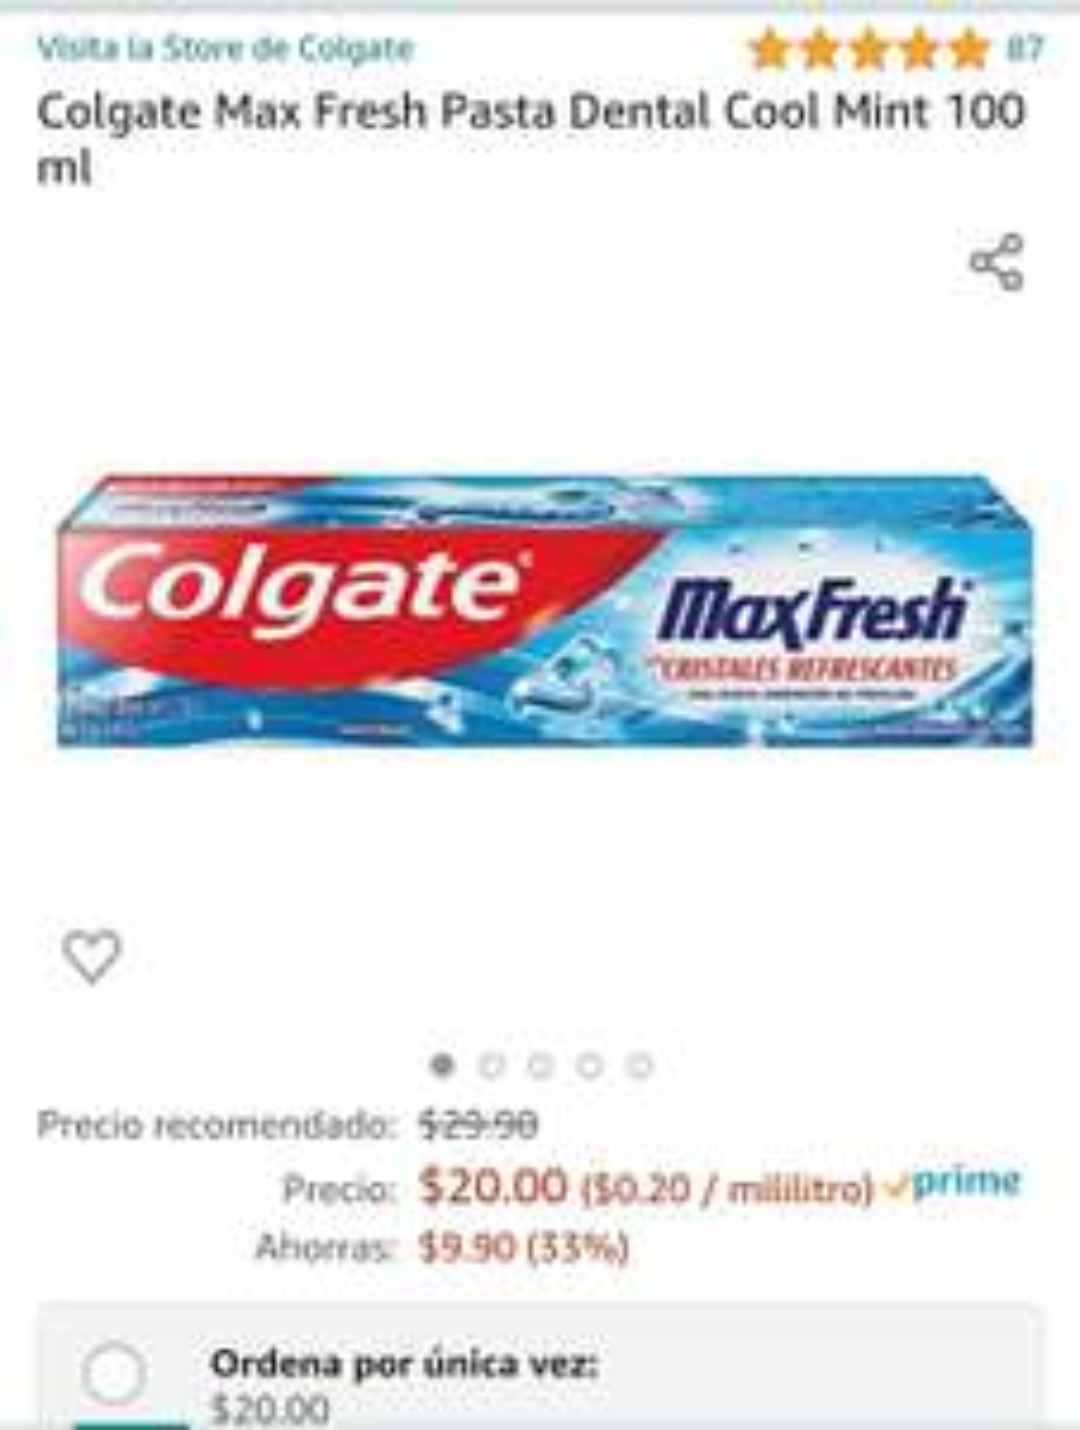 Amazon: Colgate Maxfresh con planea y cancela